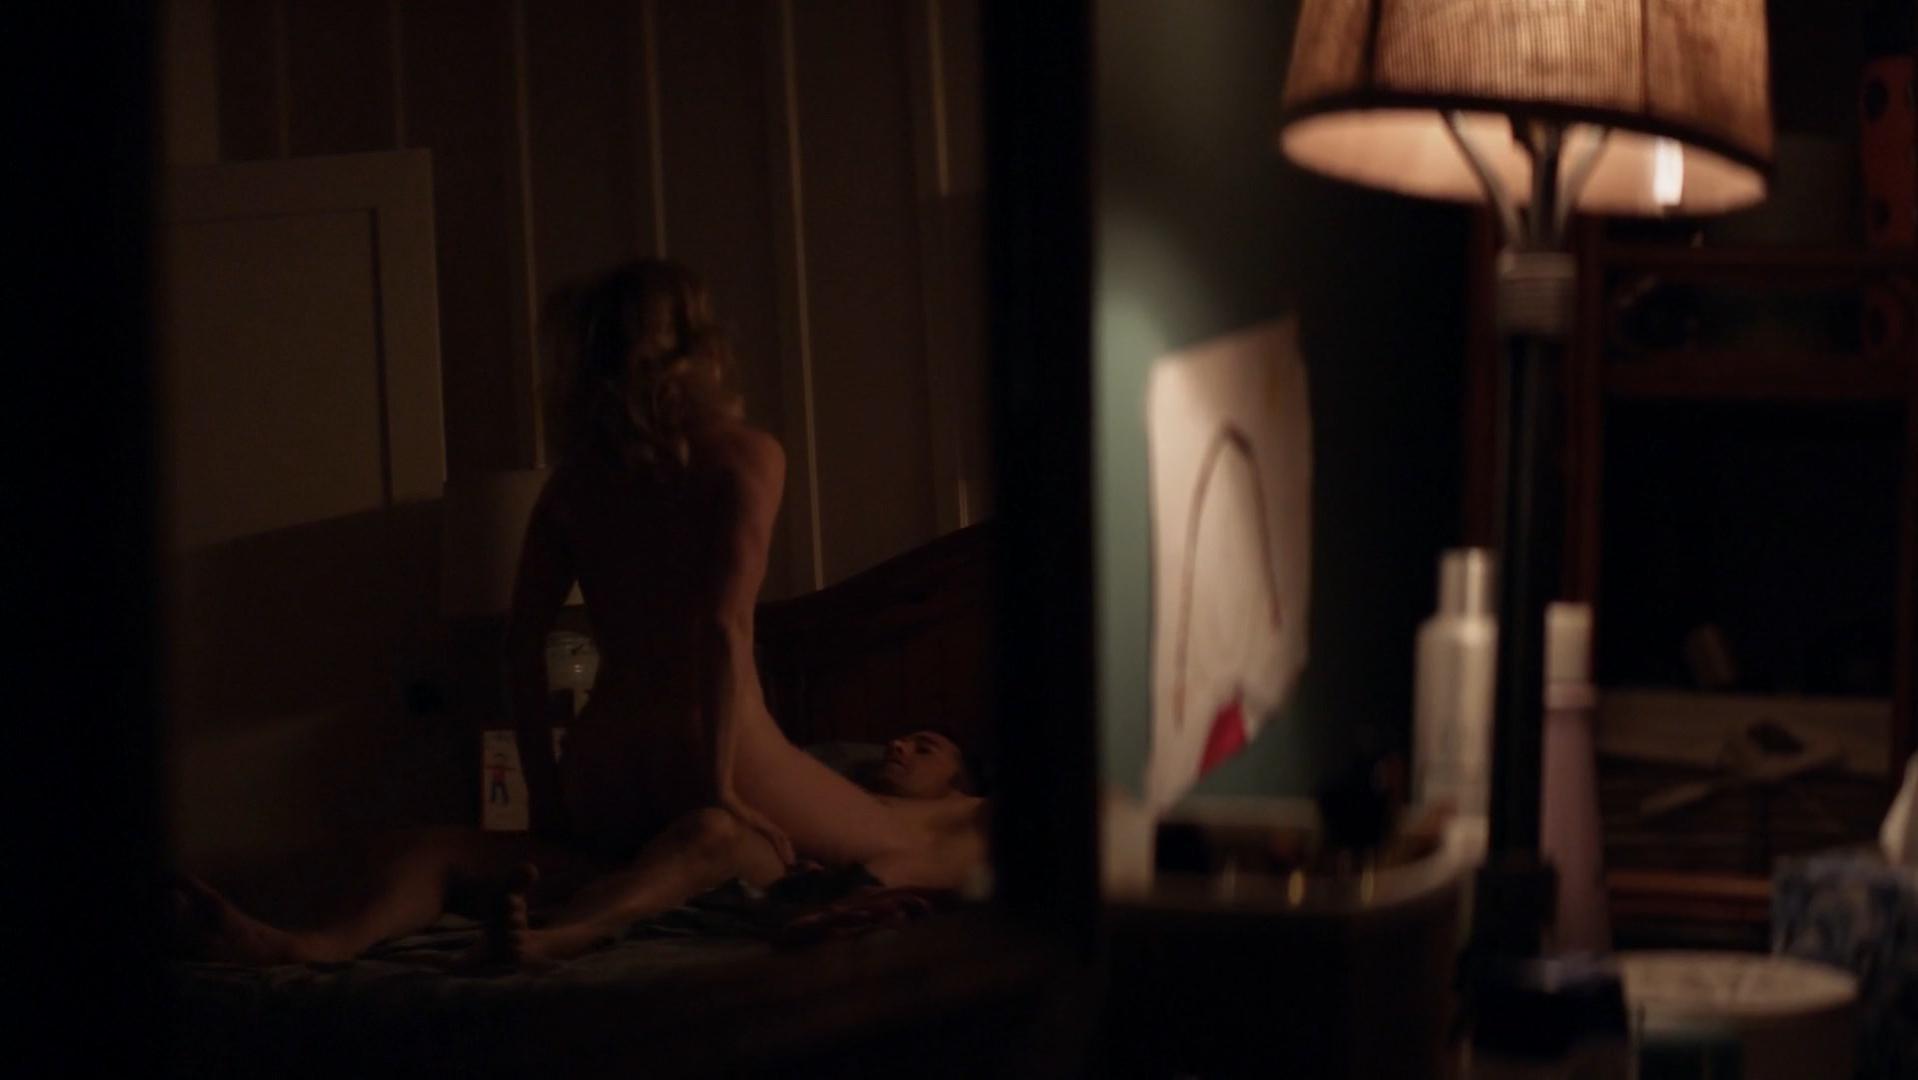 Chelsea Blechman nude - Animal Kingdom s02e01 (2017)